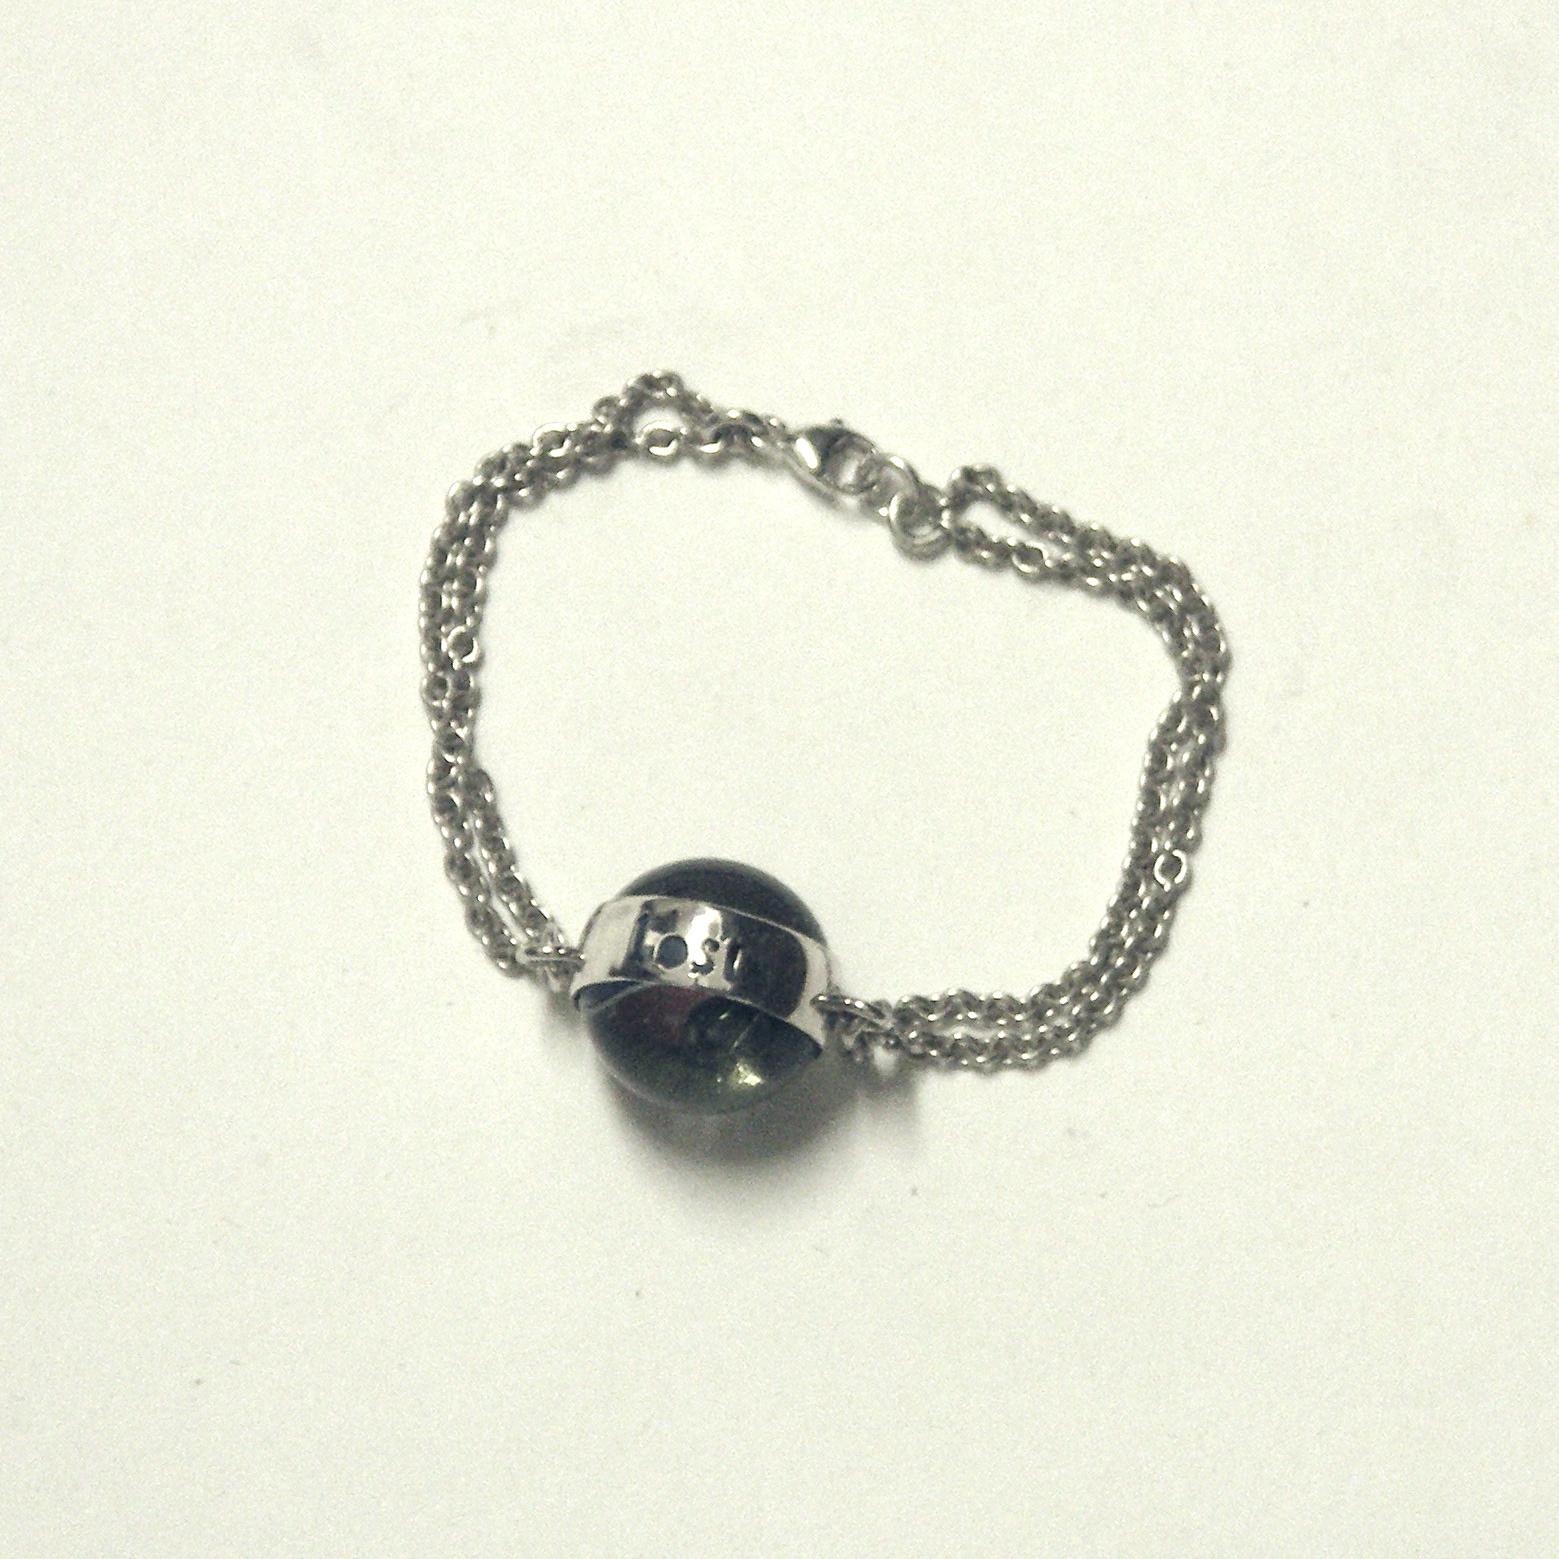 LMB-Lost marble bracelet